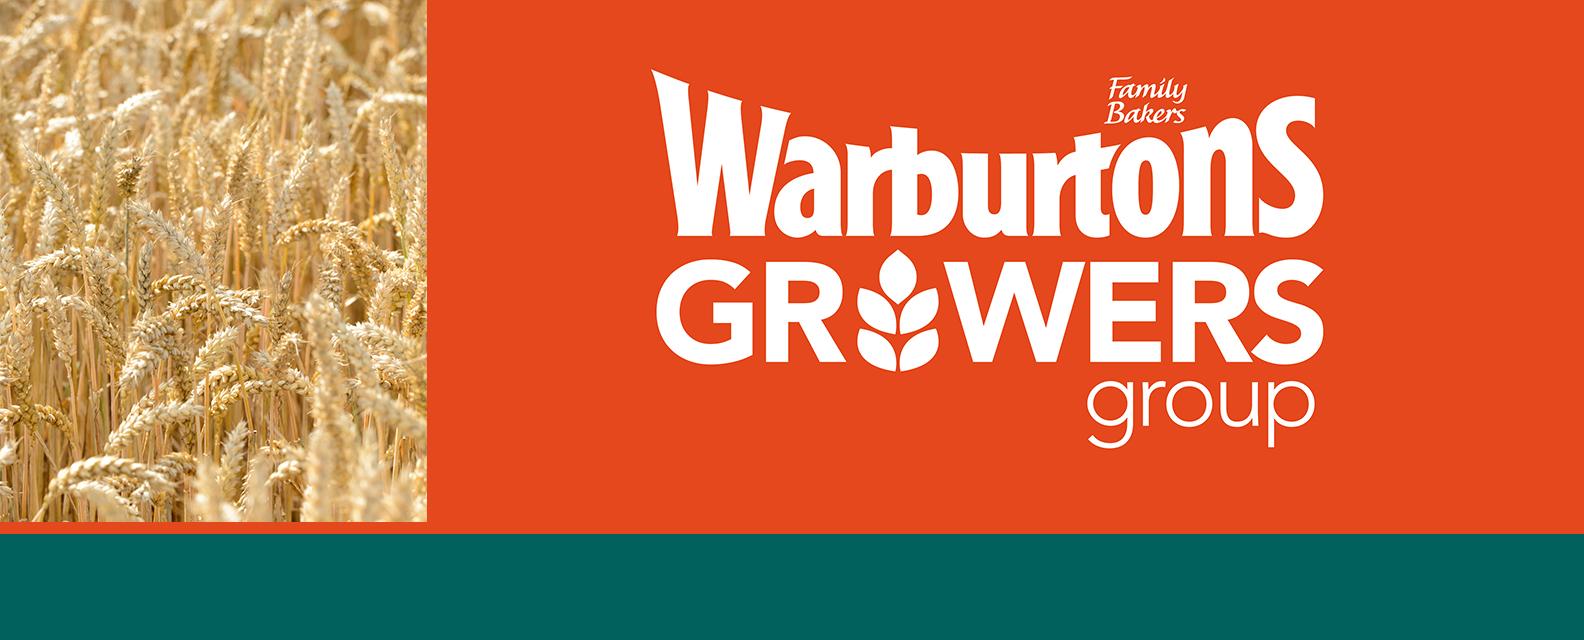 Warburtons header image WEB